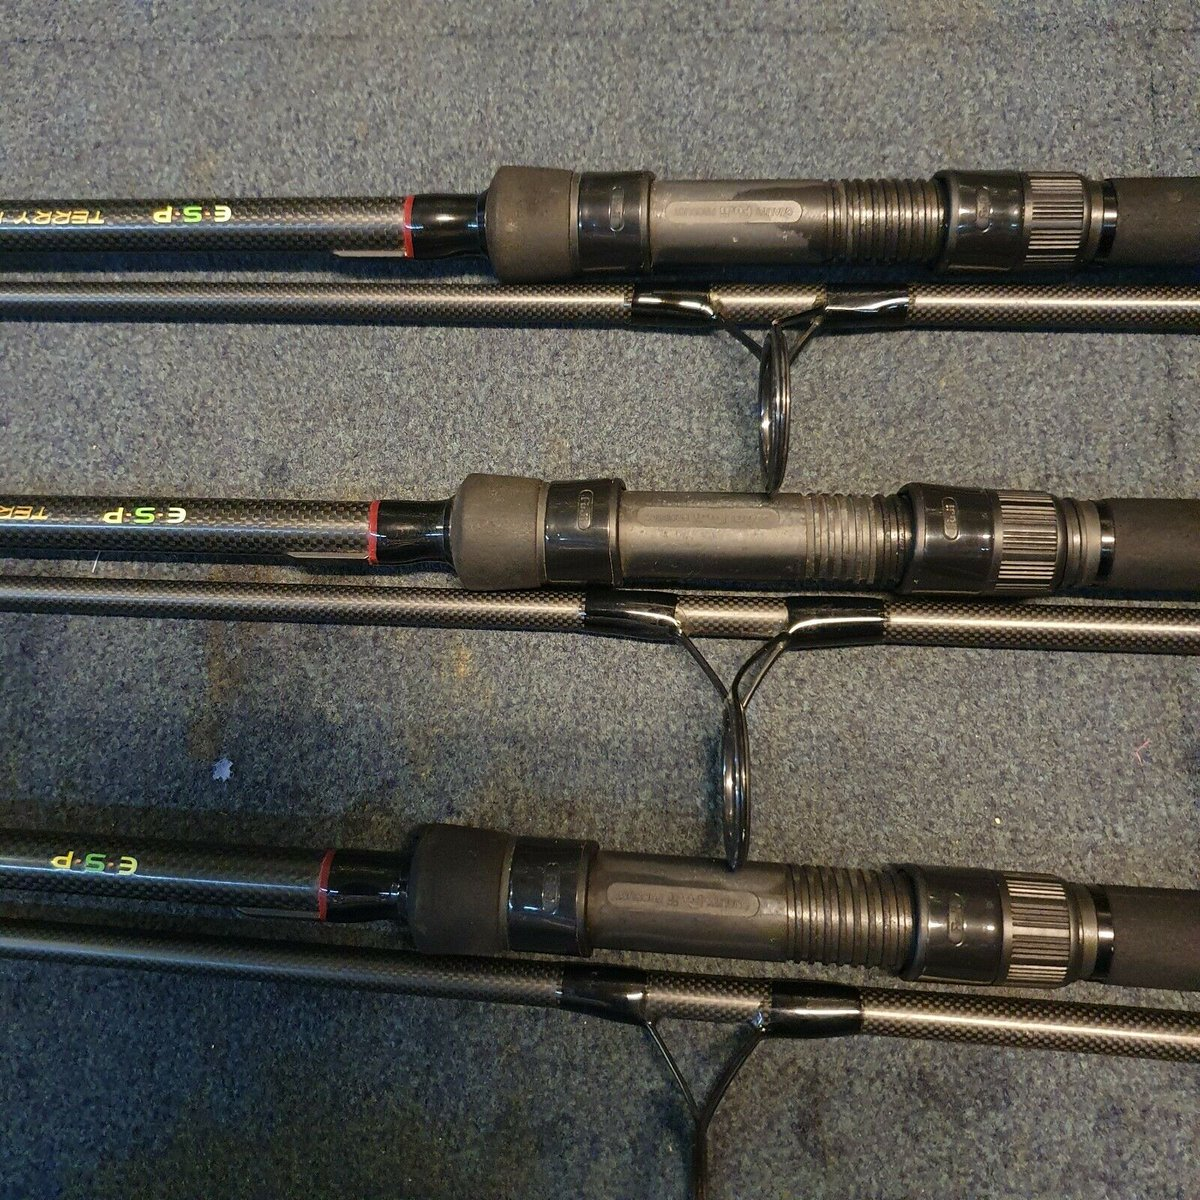 Ad - ESP Terry Hearn distance 12`9 3.5tc 50mm carp <b>Rods</b> On eBay here -->> https://t.co/